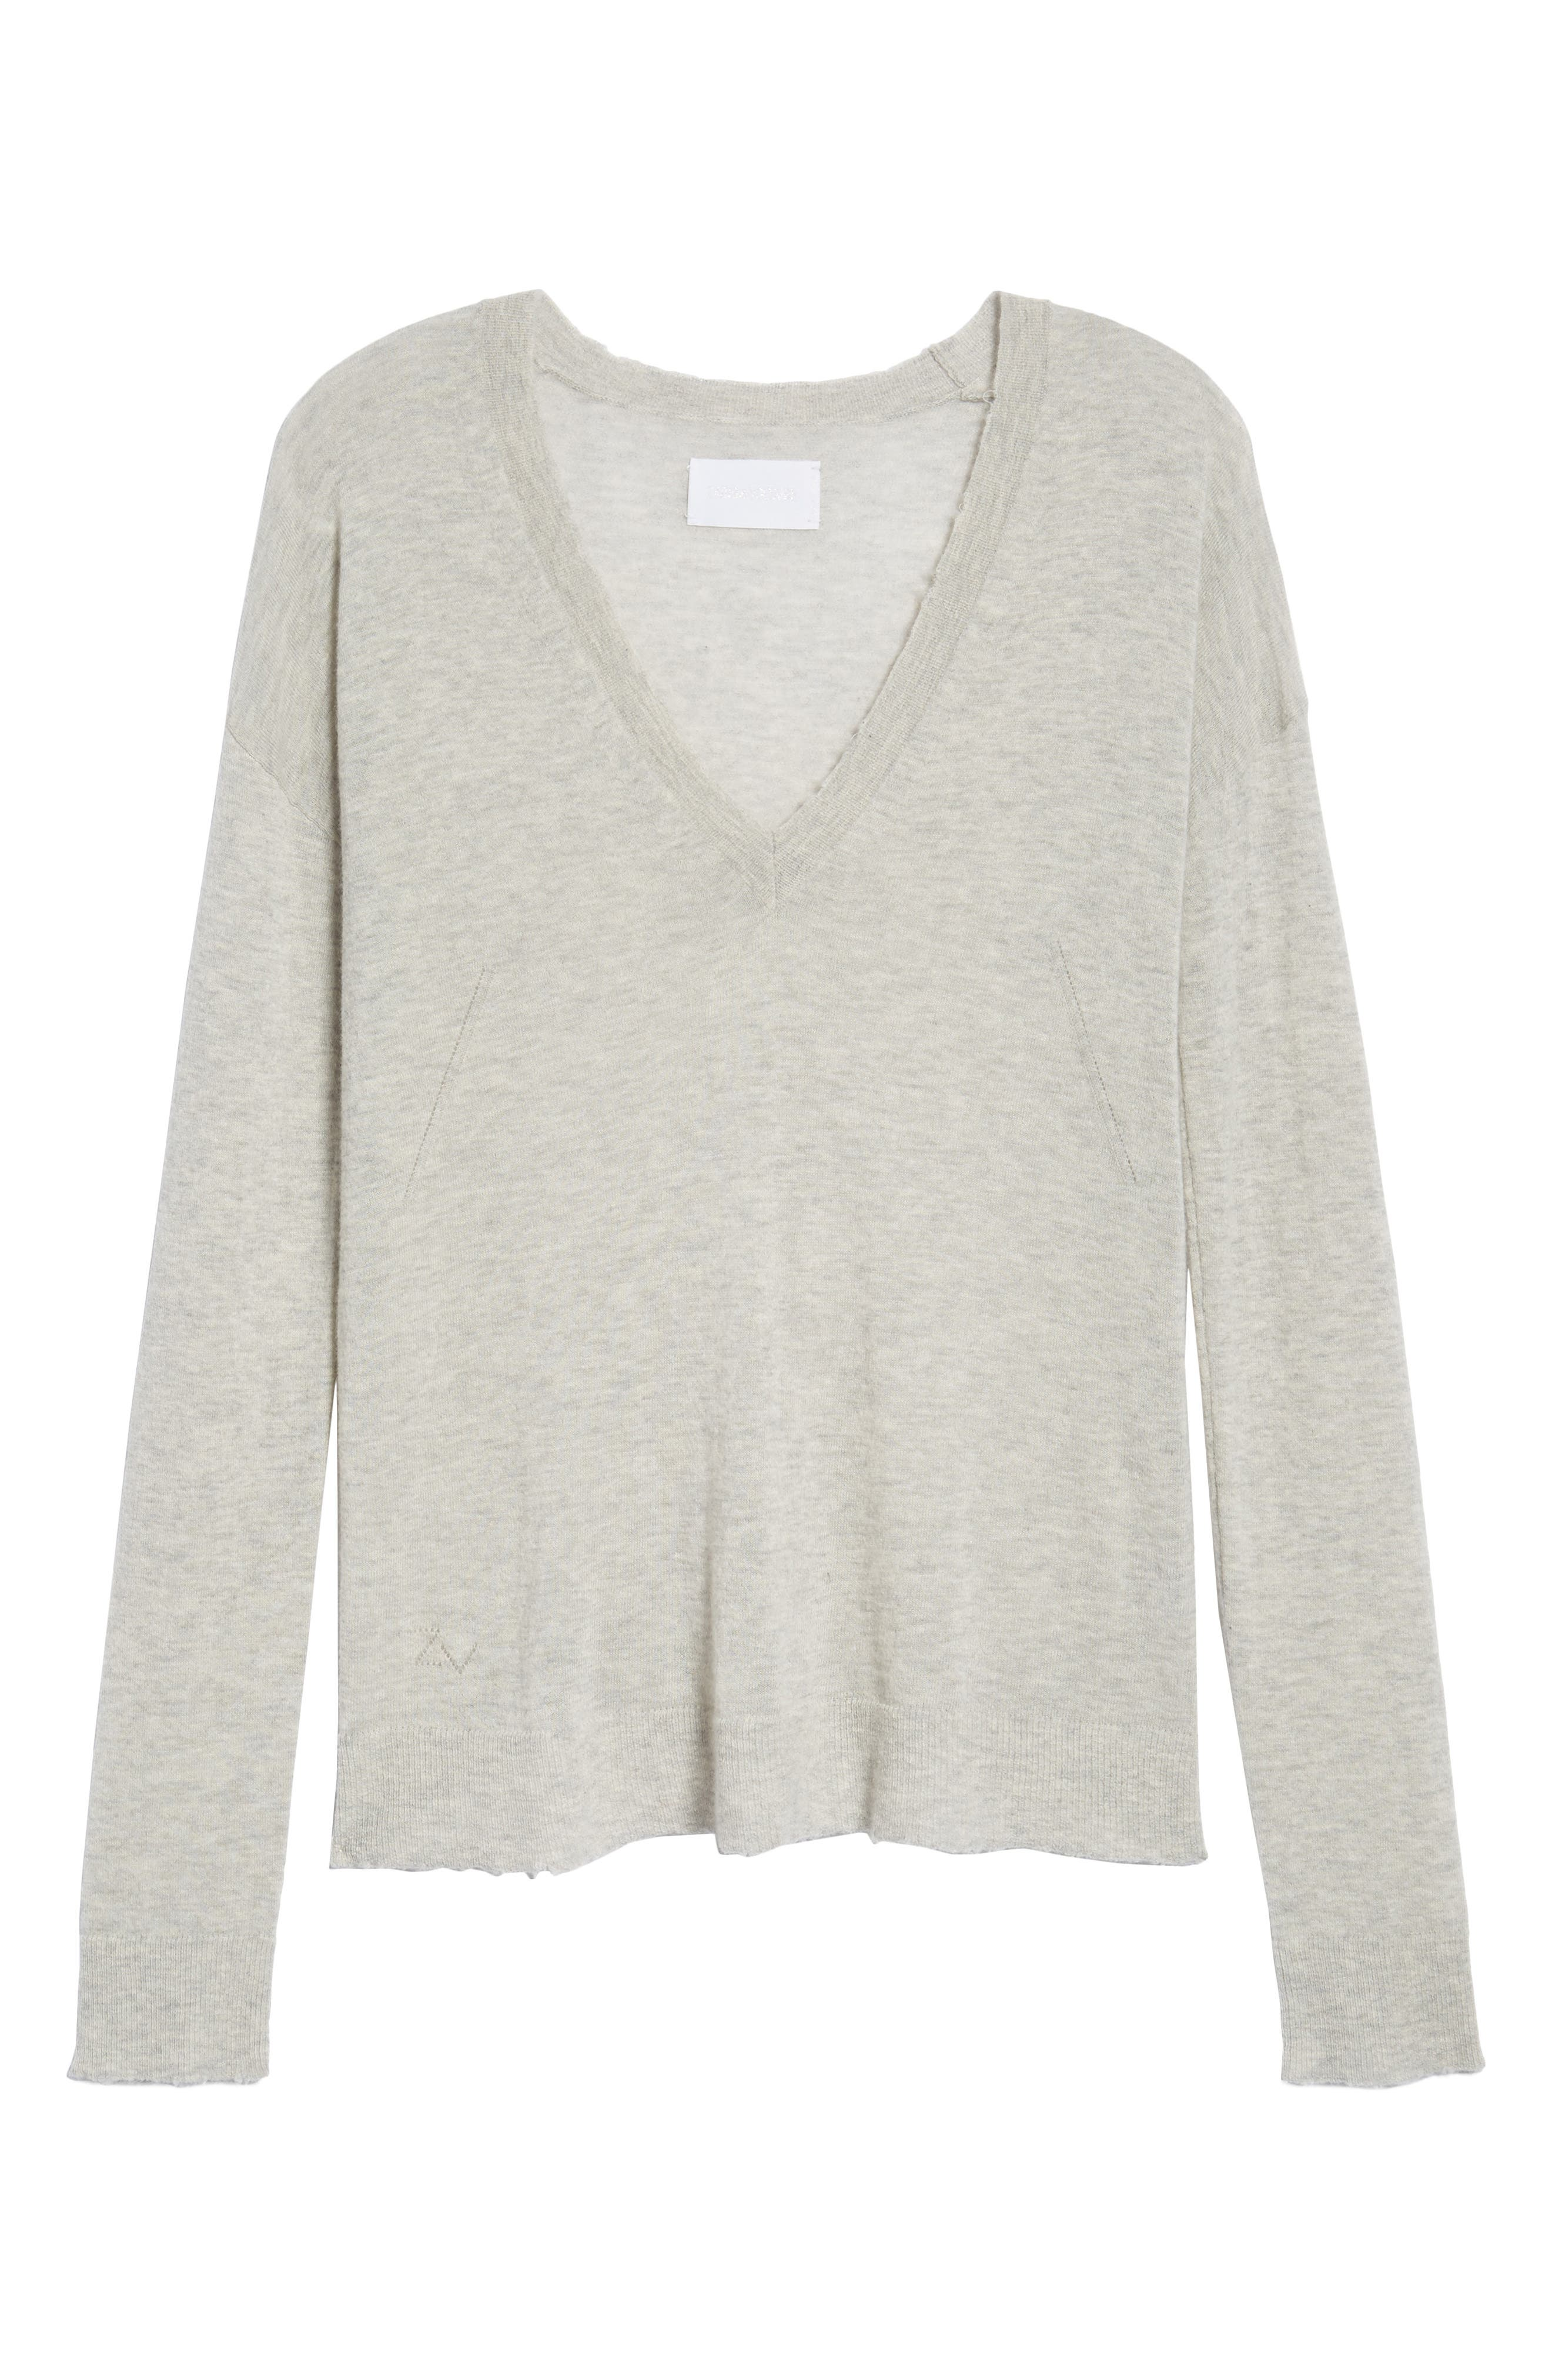 V-Neck Cashmere Sweater,                             Alternate thumbnail 6, color,                             254